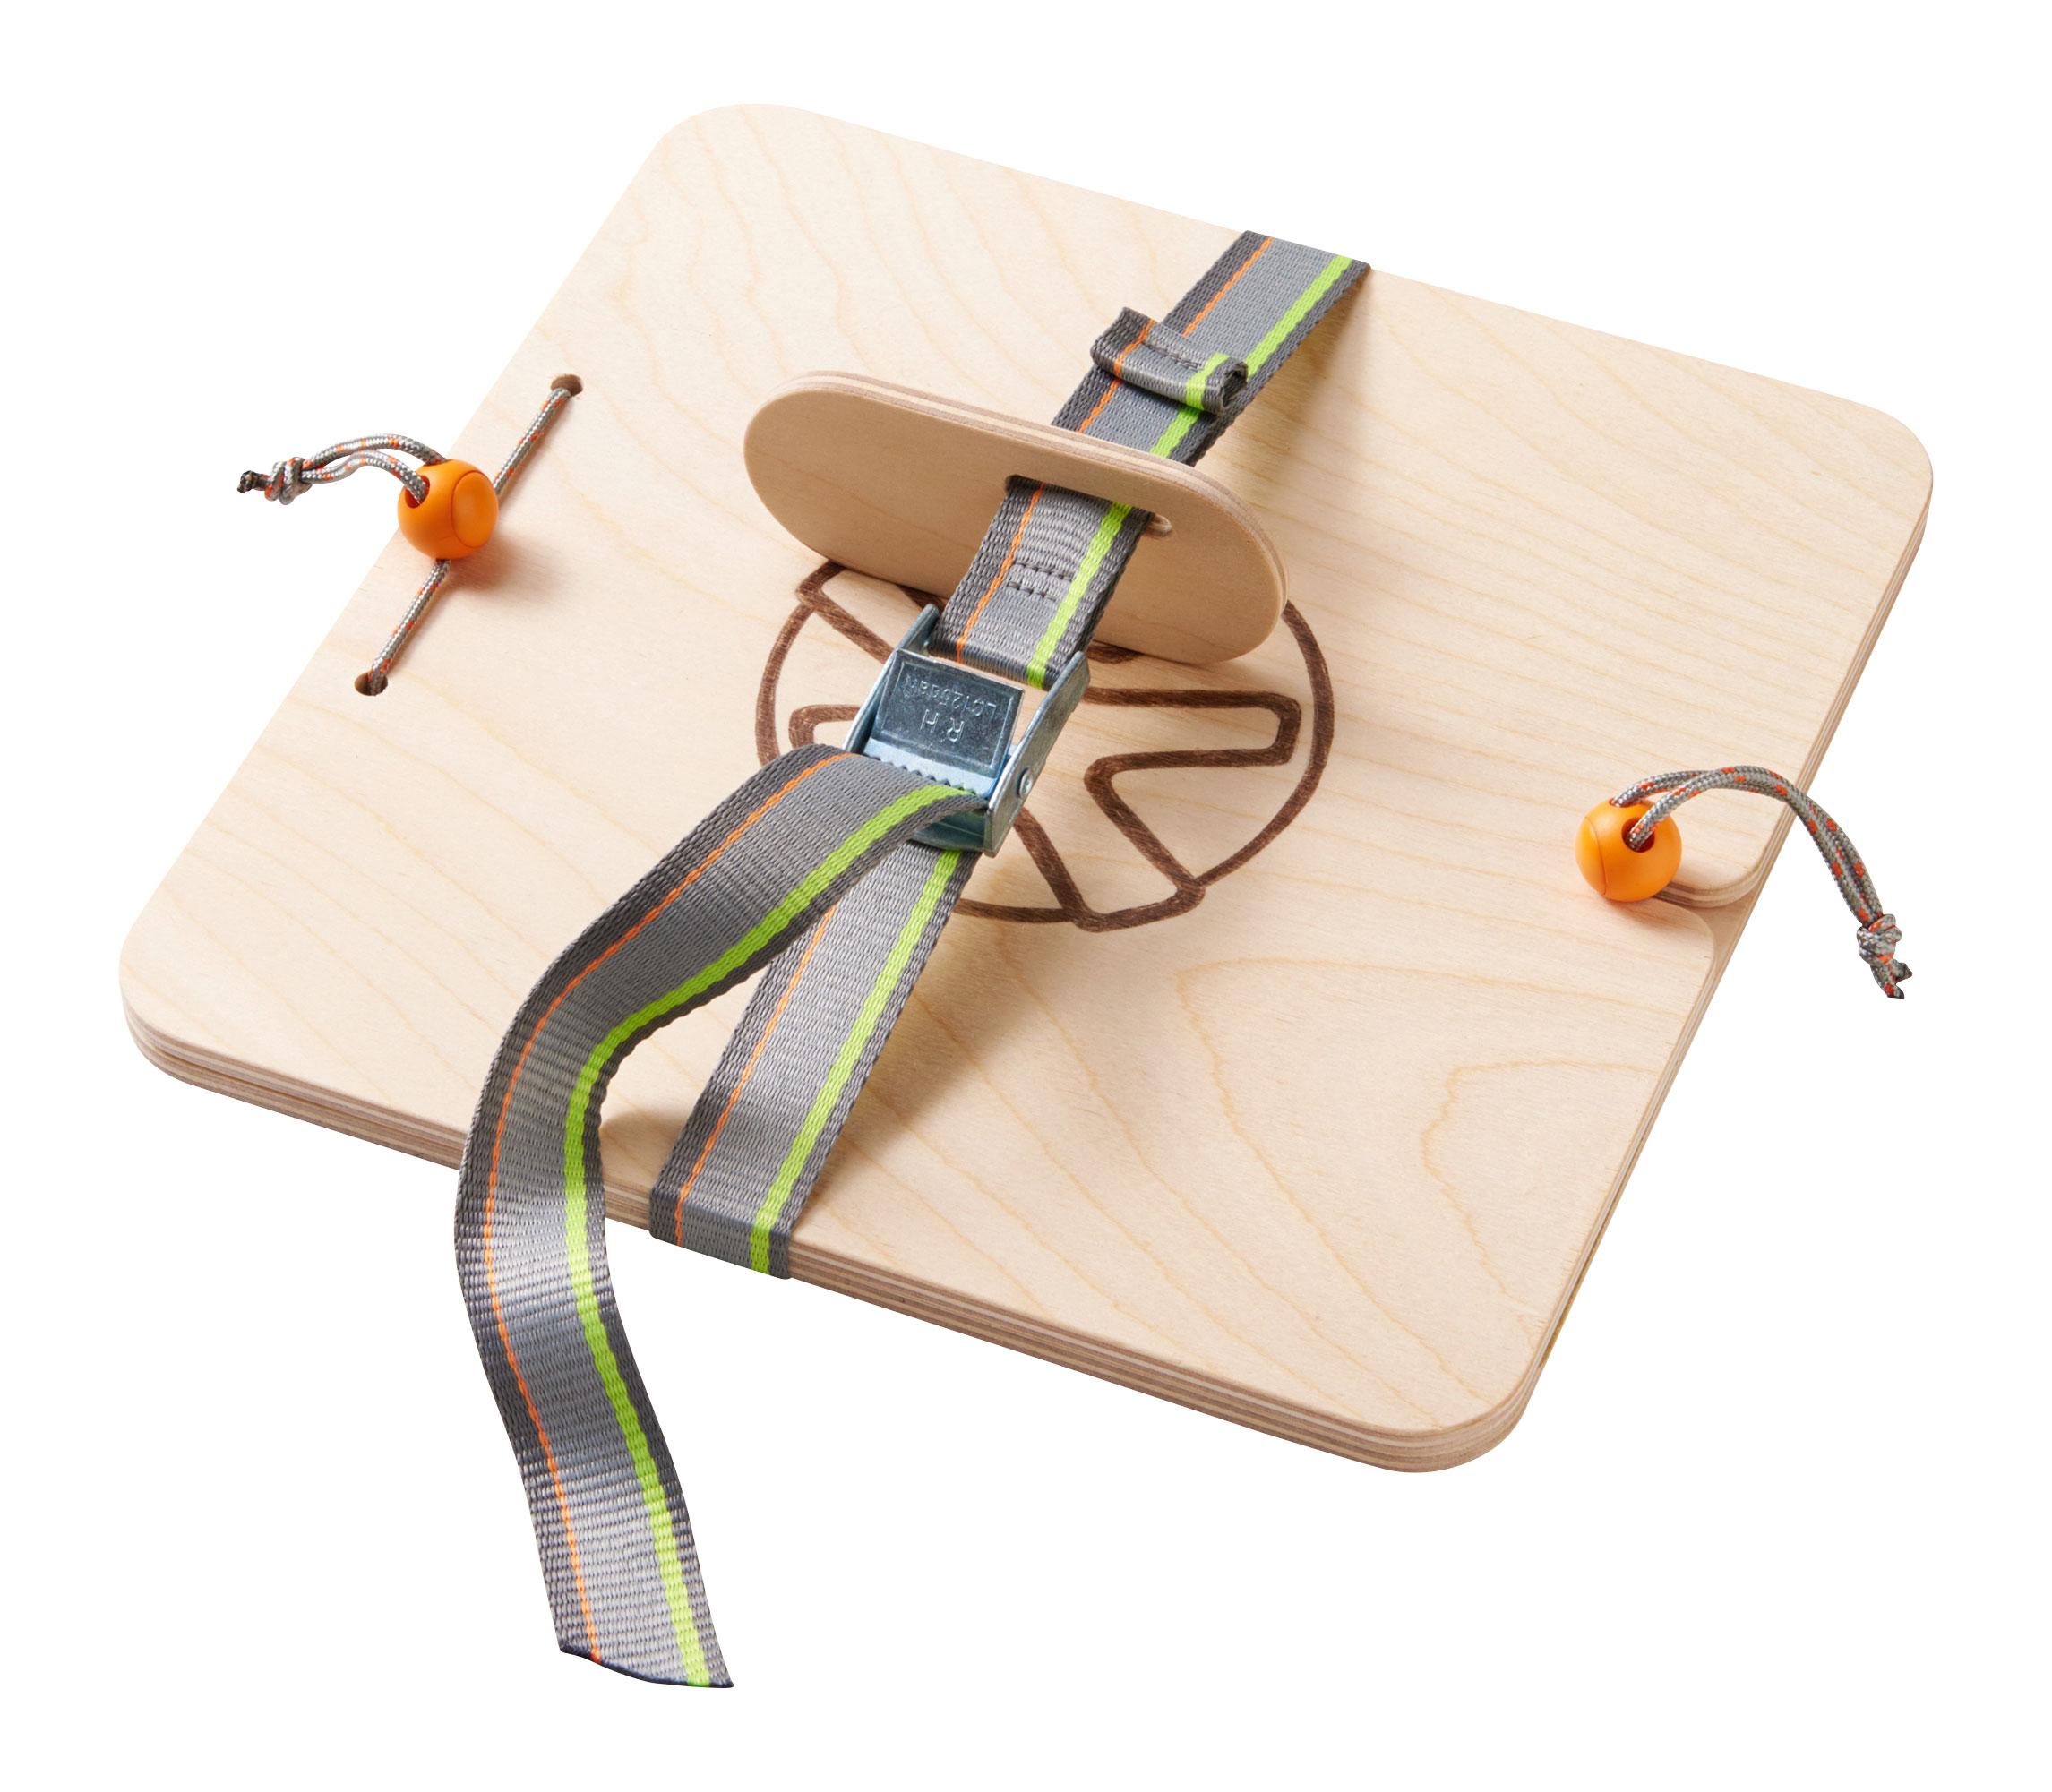 haba terra kids pflanzenpresse g nstig kaufen im online shop. Black Bedroom Furniture Sets. Home Design Ideas